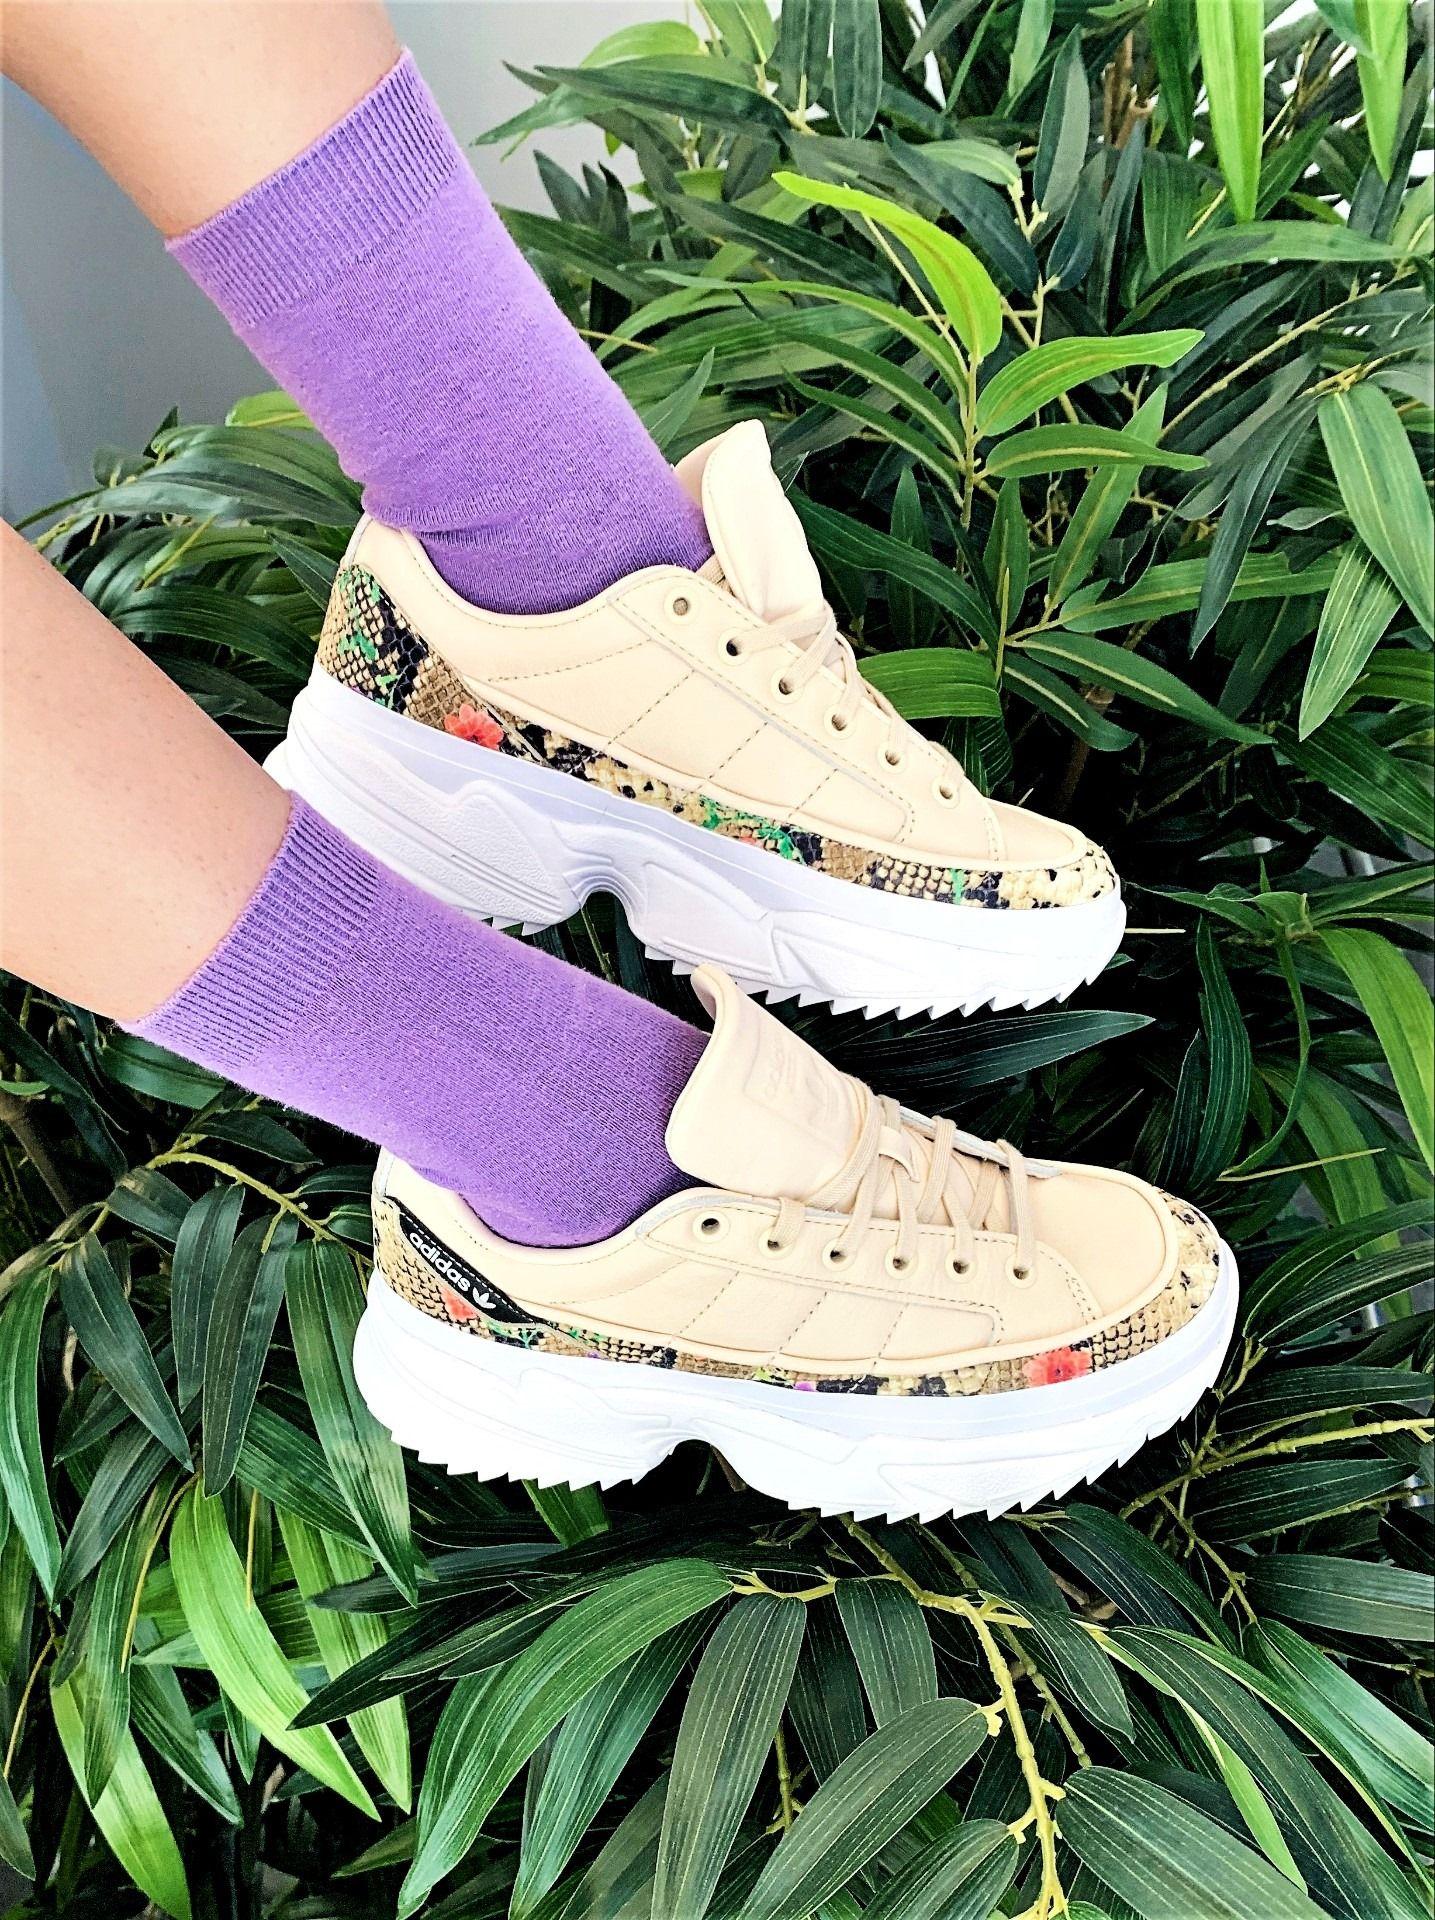 Adidas Kiellor Womens Athlokinisi Adidas Originals Sneakers Adidas